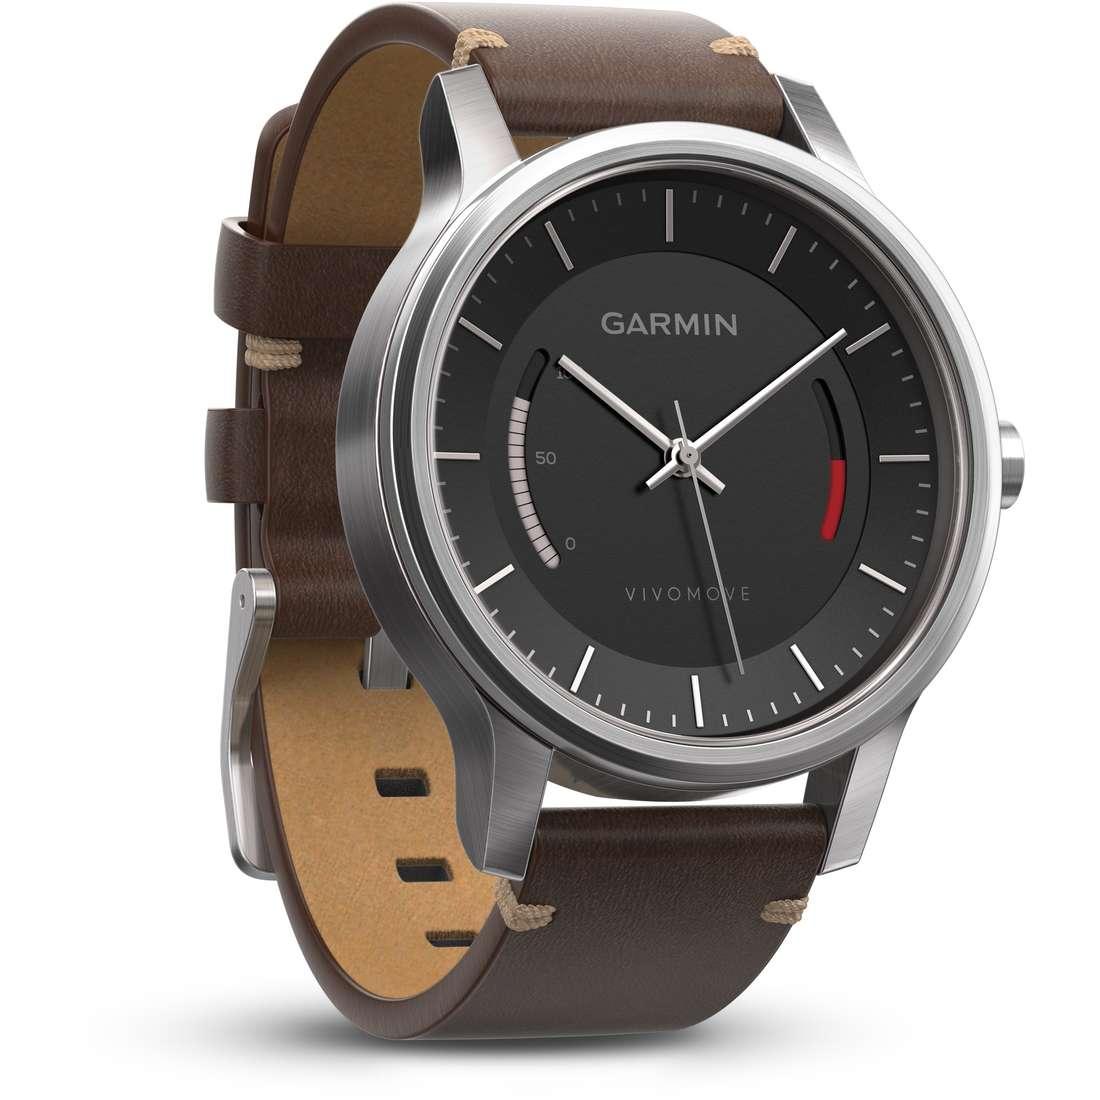 watch digital unisex Garmin Vivomove 010-01597-20